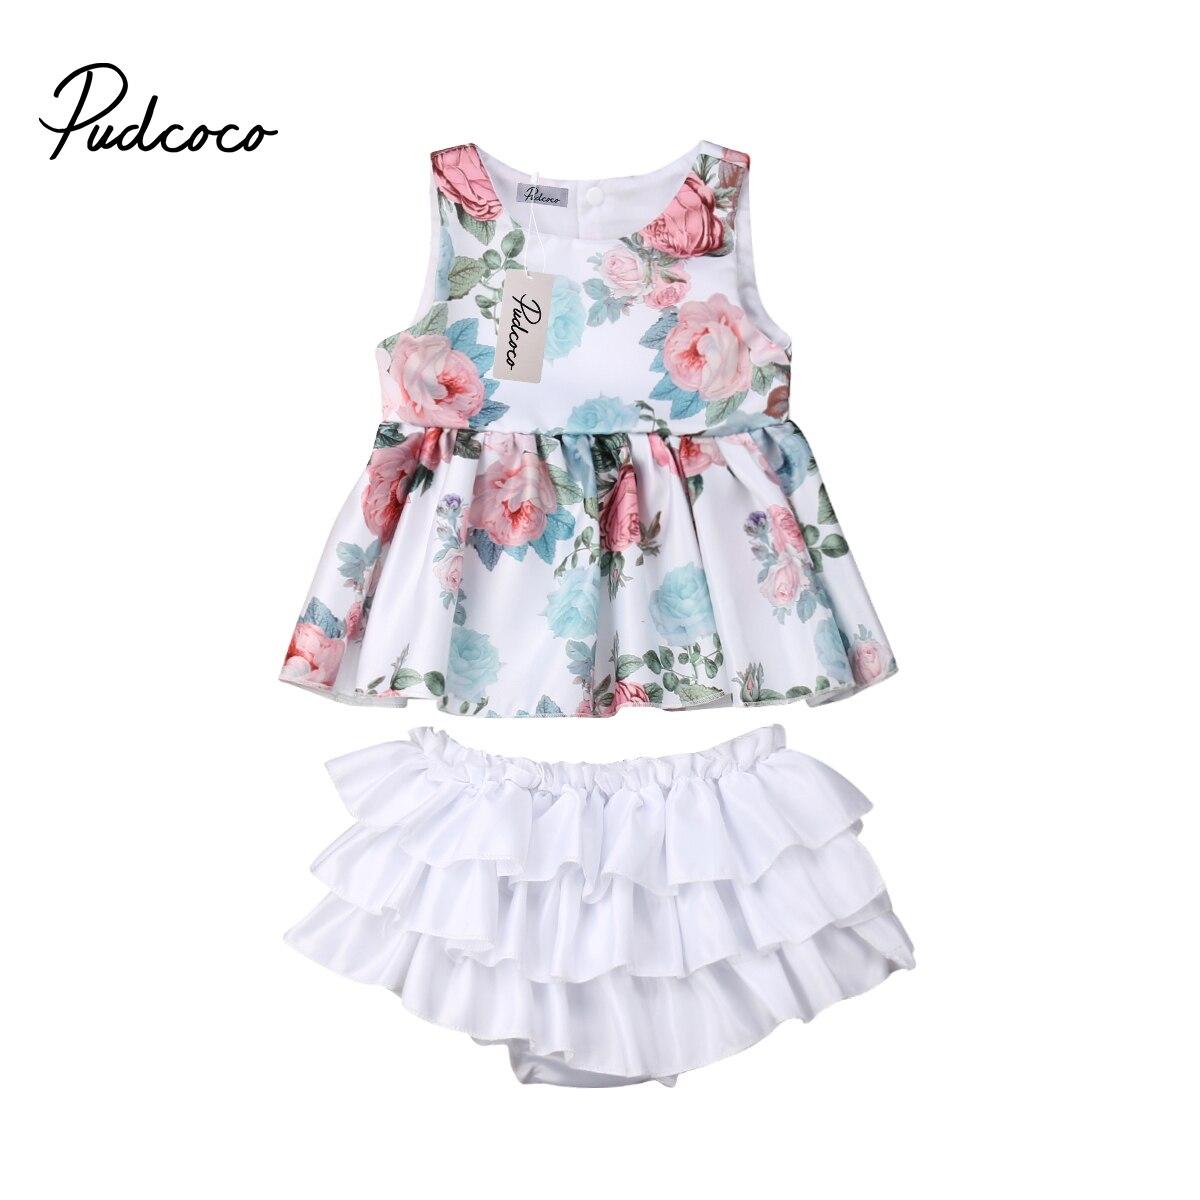 Pudcoco Neugeborenen Baby Mädchen Cartoon Sleeveless Tank Tops T shirt + Shorts Briefs 2 stücke Outfits Sommer Kinder Mädchen Baumwolle kleidung 0-18M